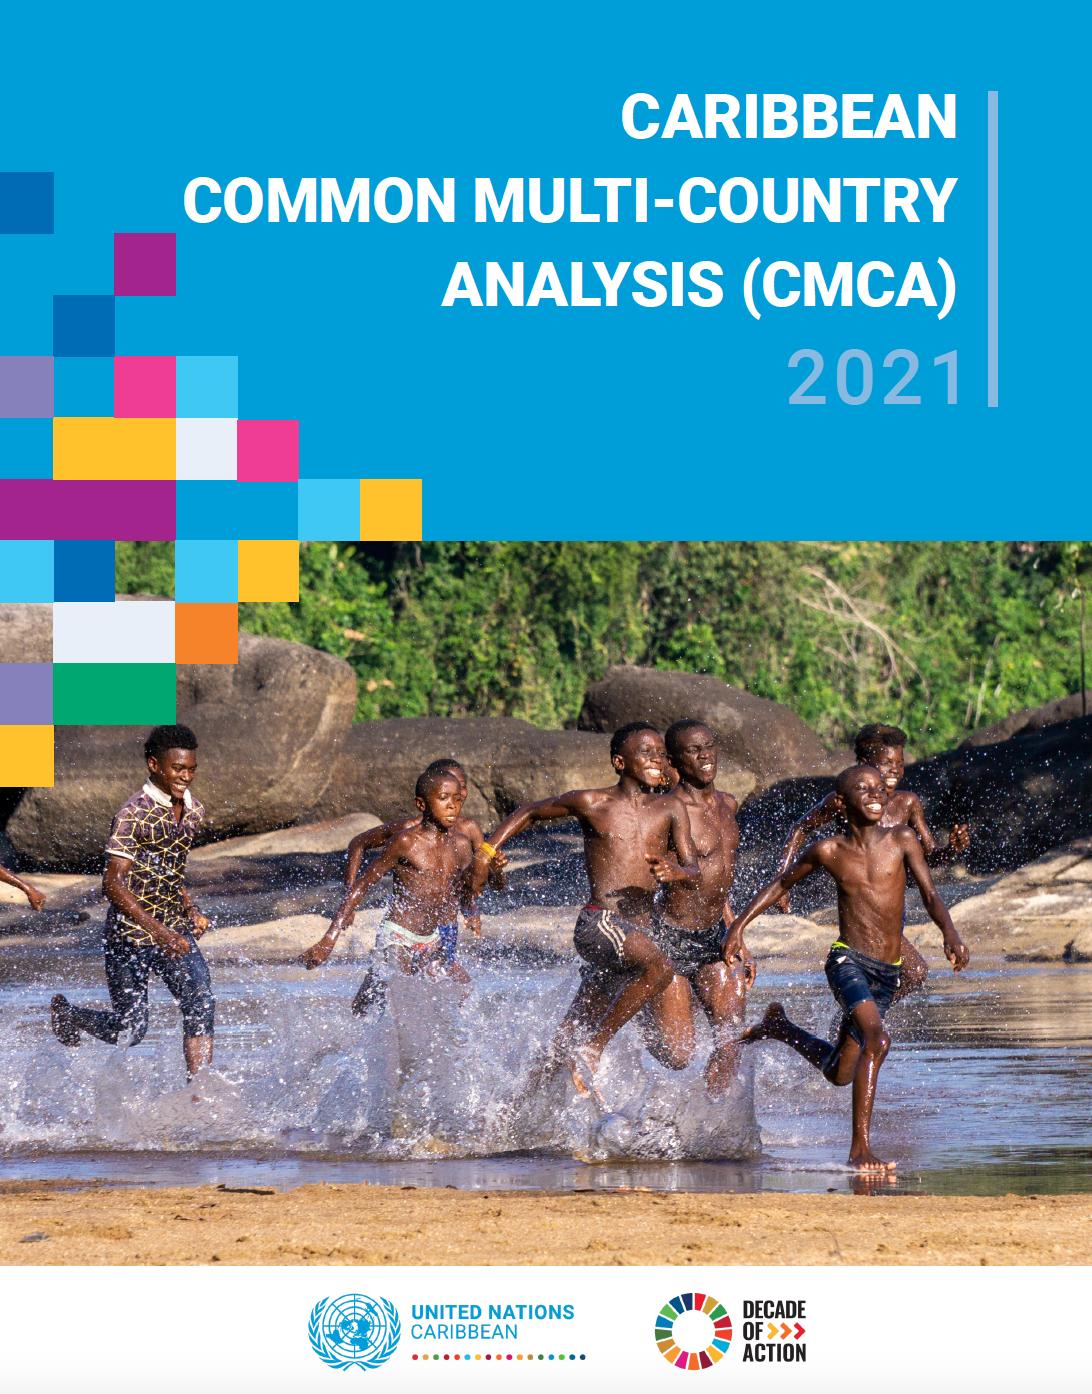 Caribbean Common Multi-Country Analysis (CMCA) 2021